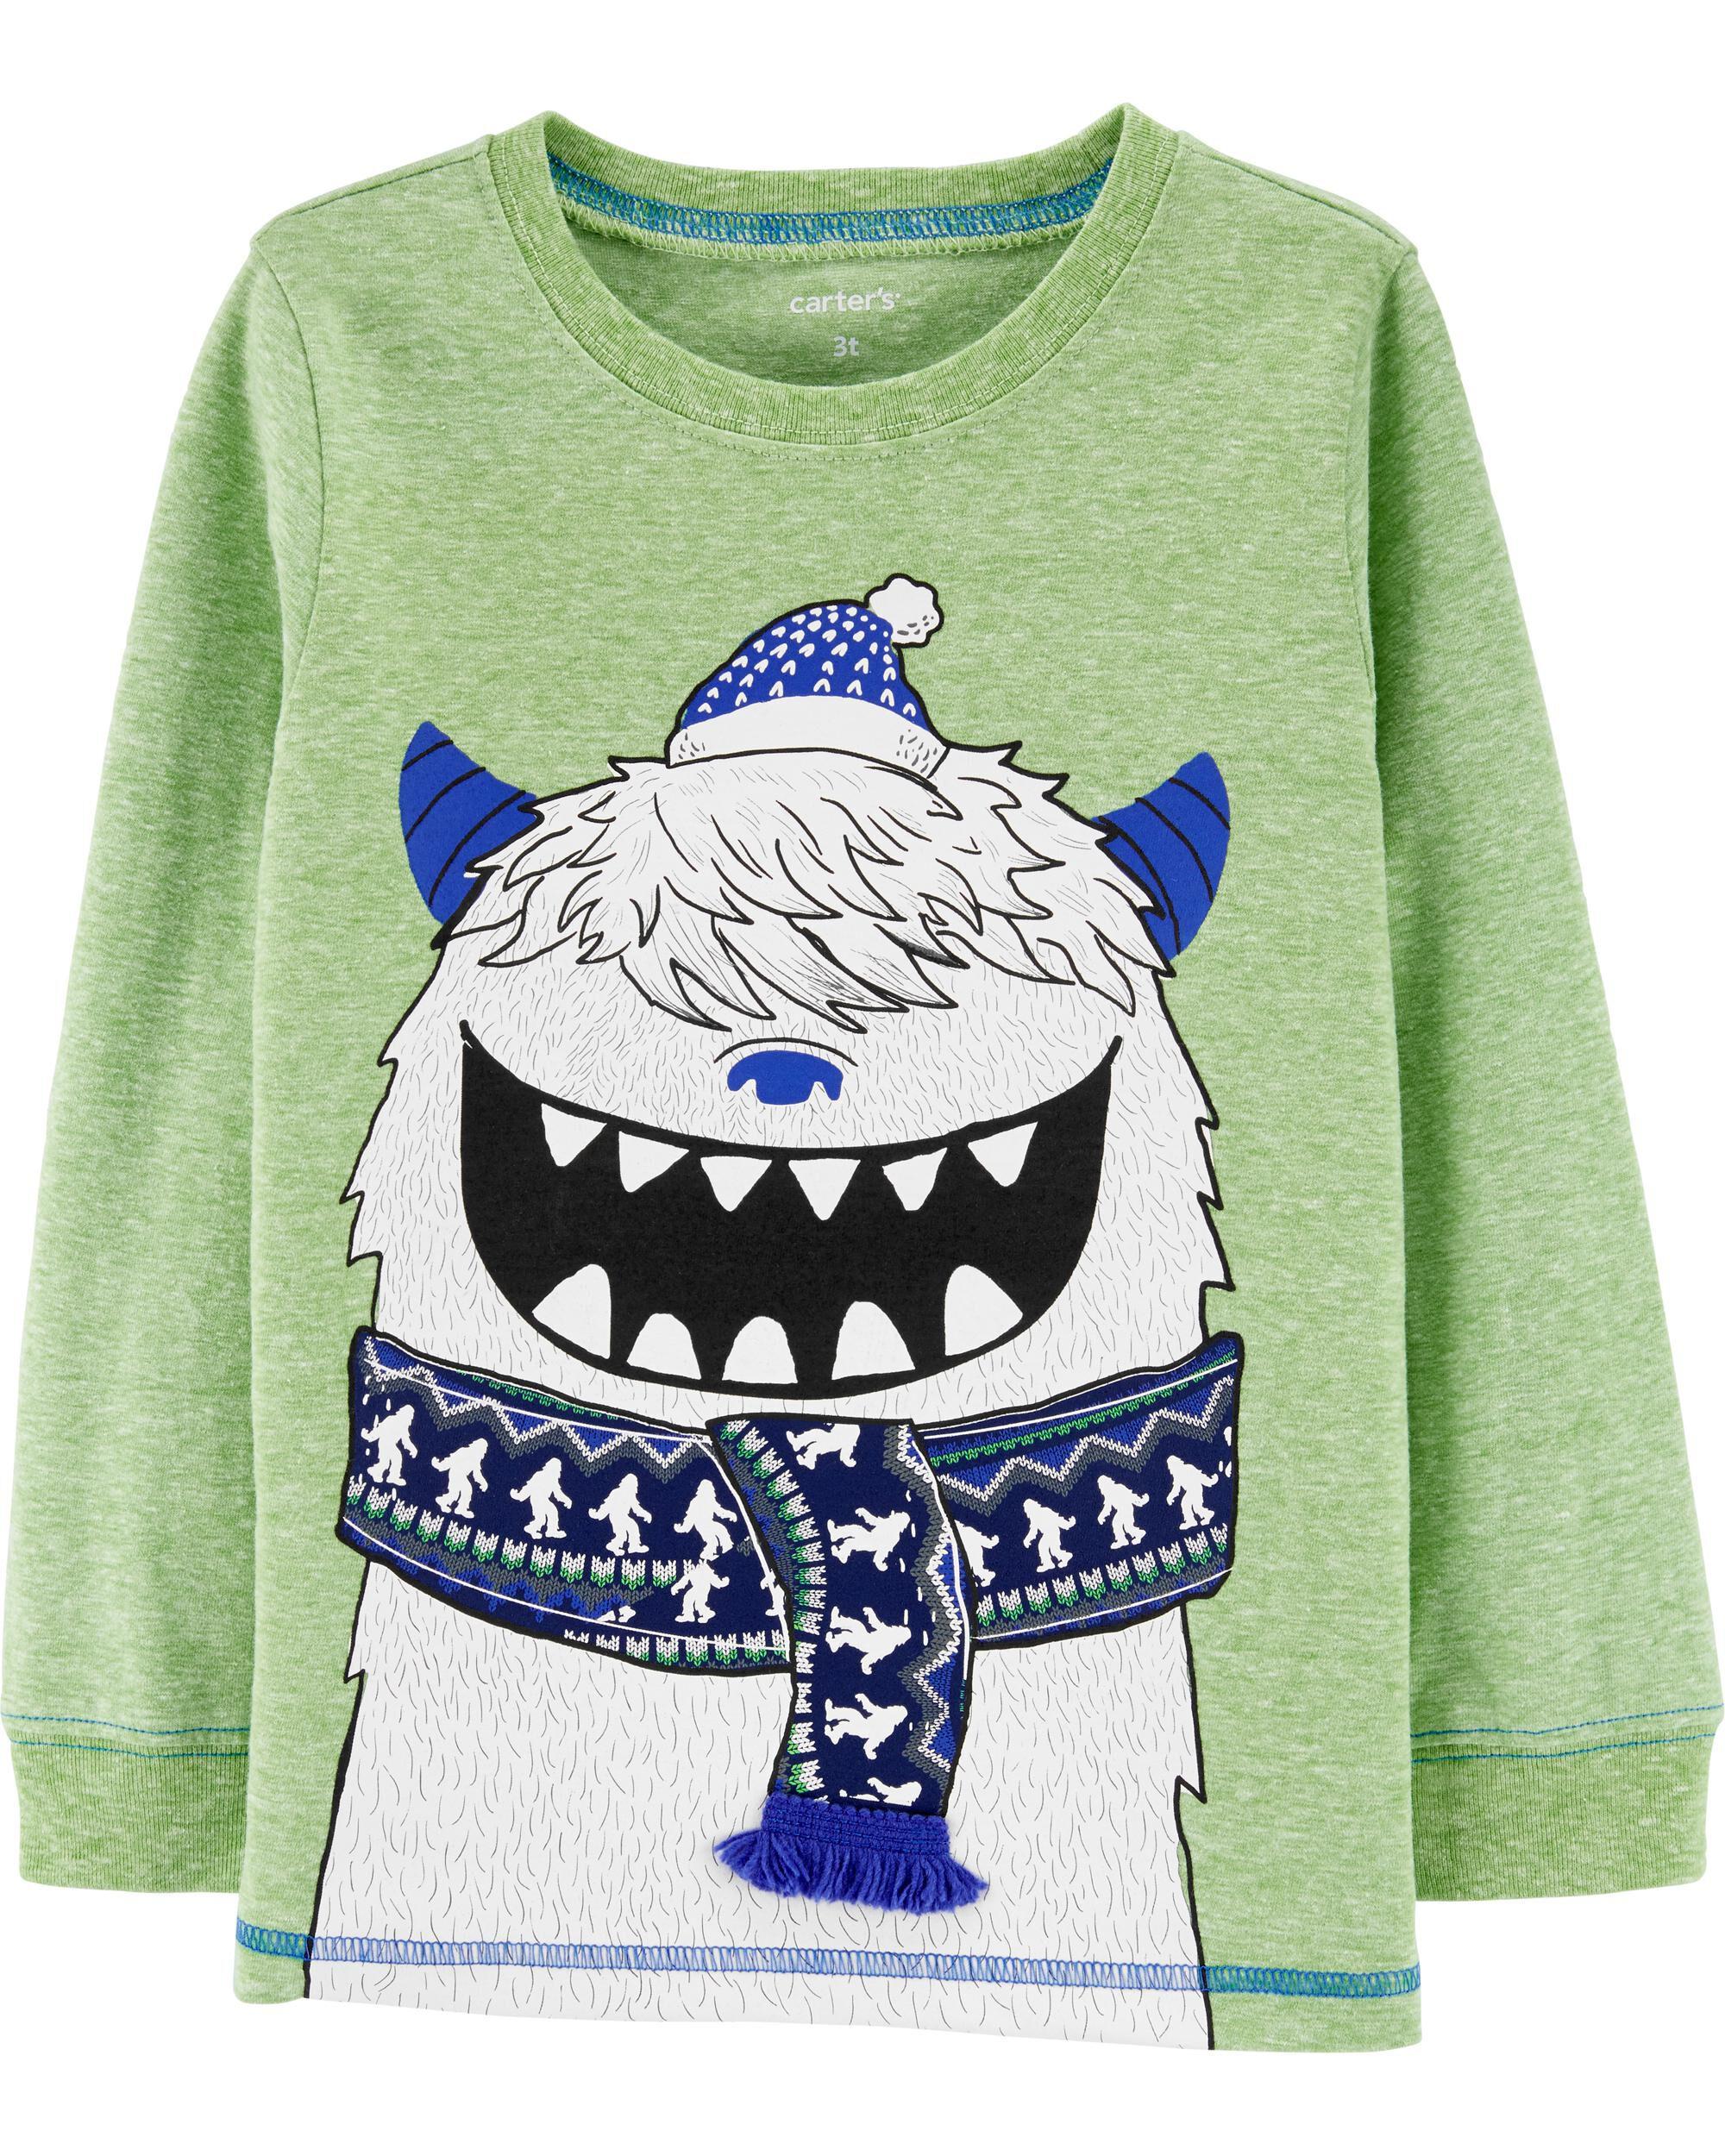 *CLEARANCE* Abominable Snowman Snow Yarn Jersey Tee